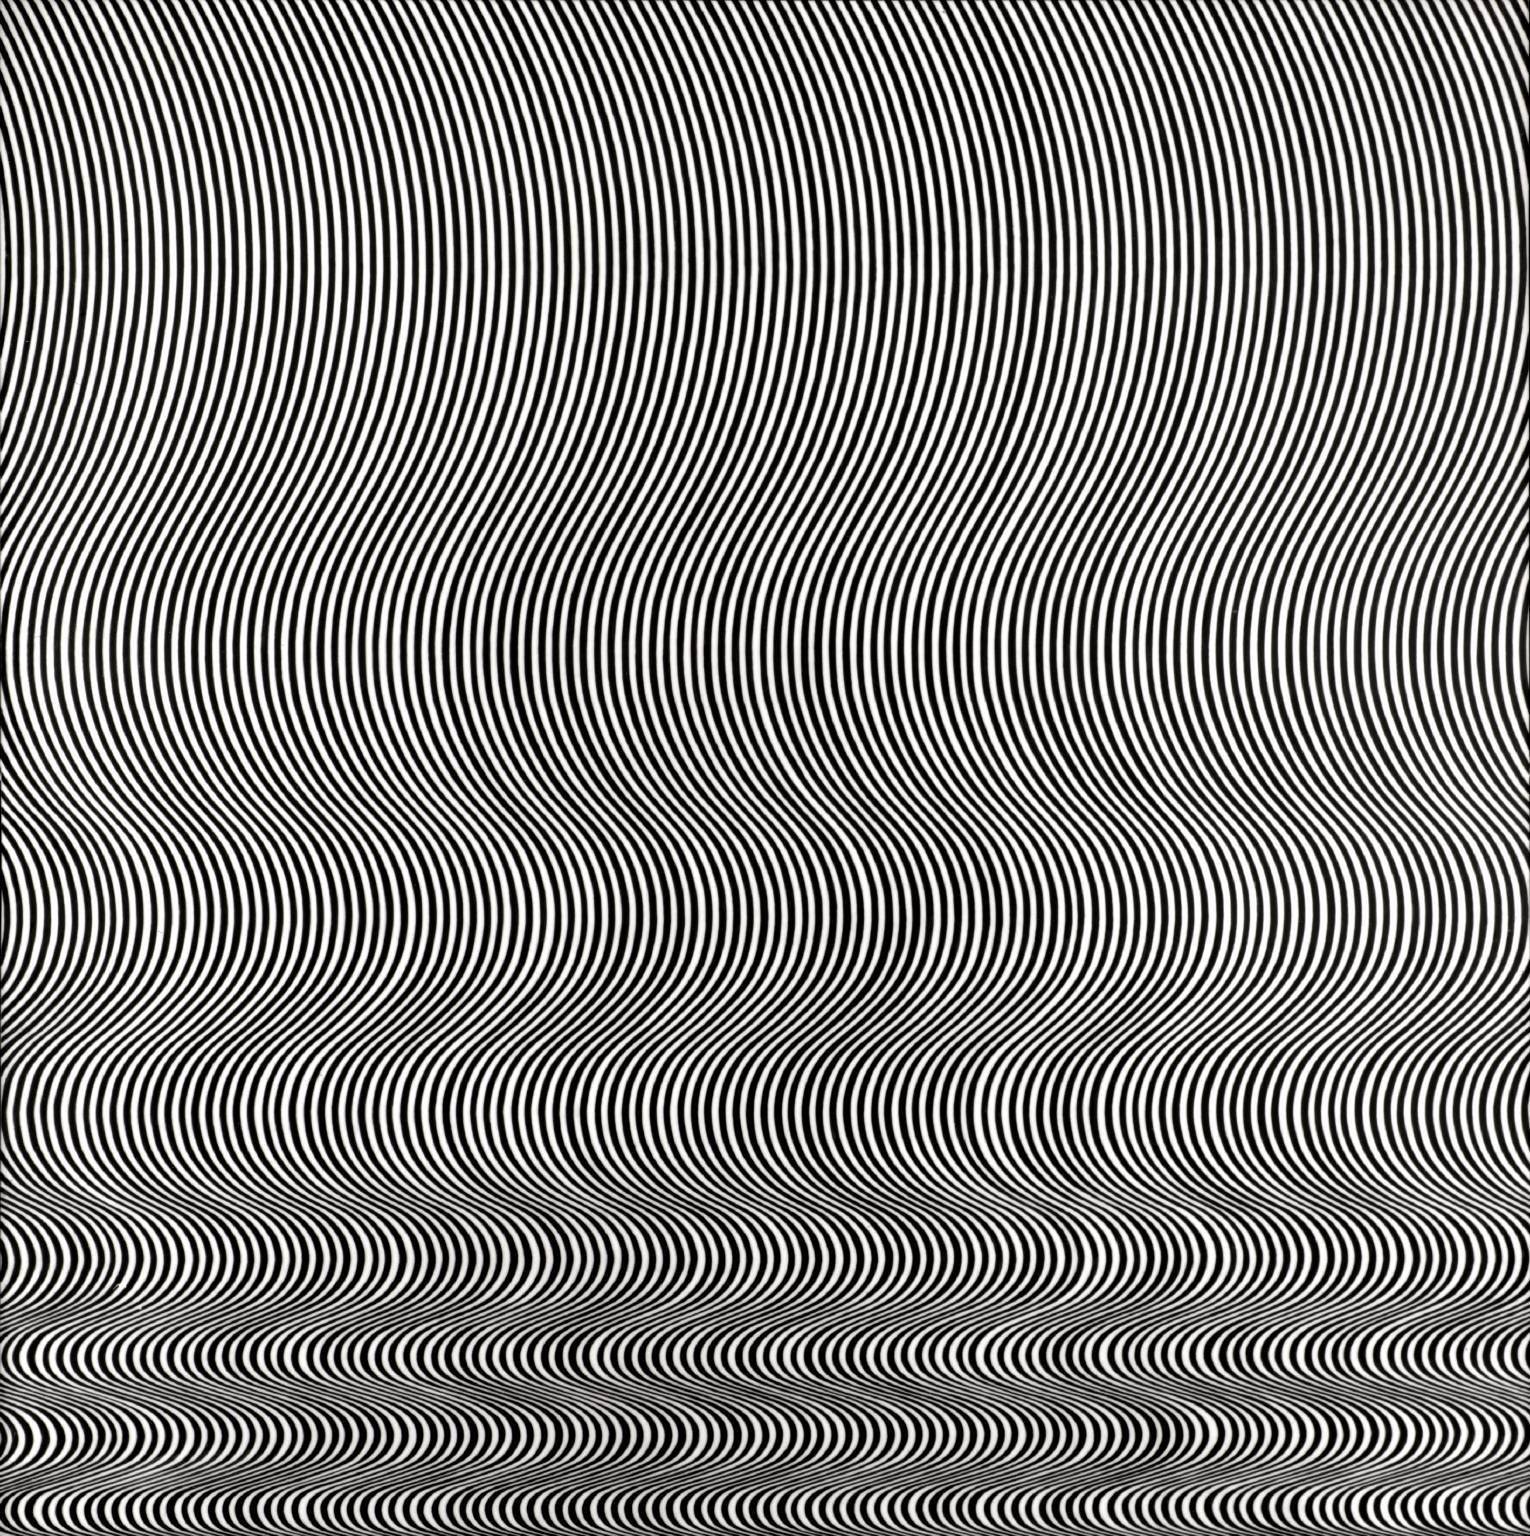 Bridget Riley: visual experiments in illusion